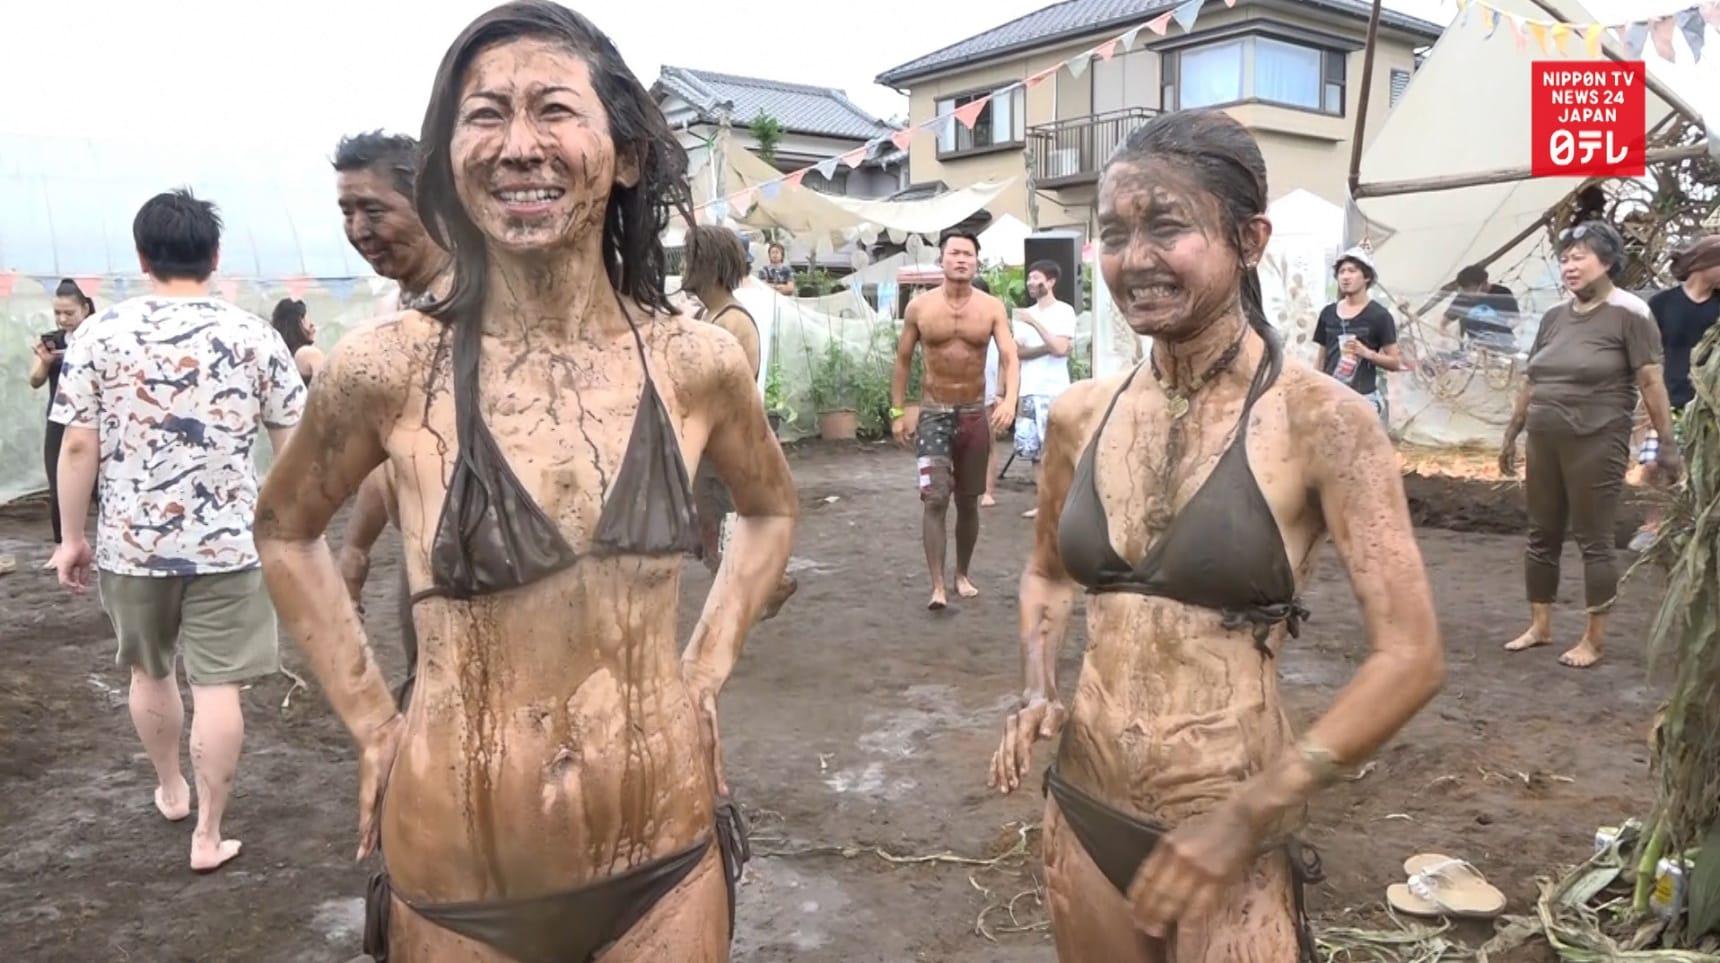 Muddy Fun at a Music & Organic Vegetable Fest